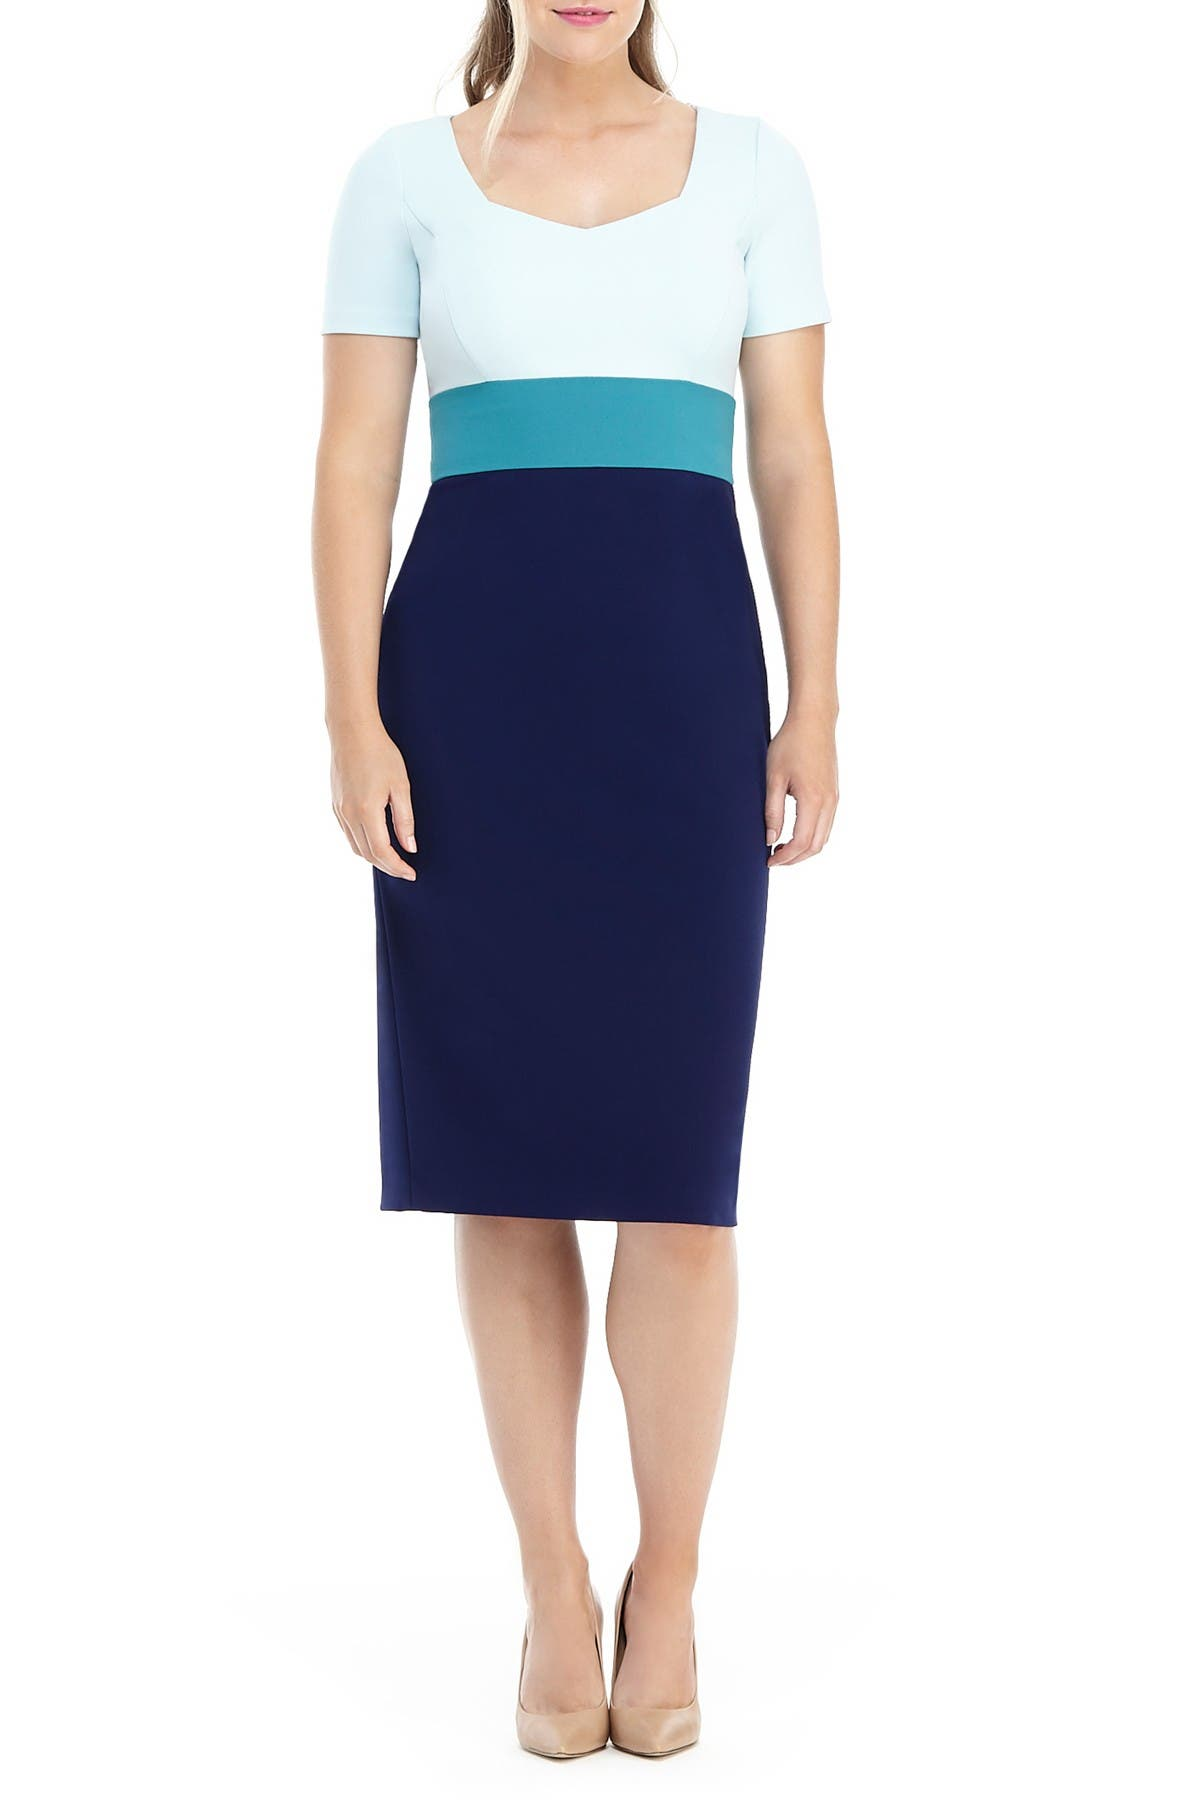 Image of Maggy London Natalia Colorblock Midi Dress